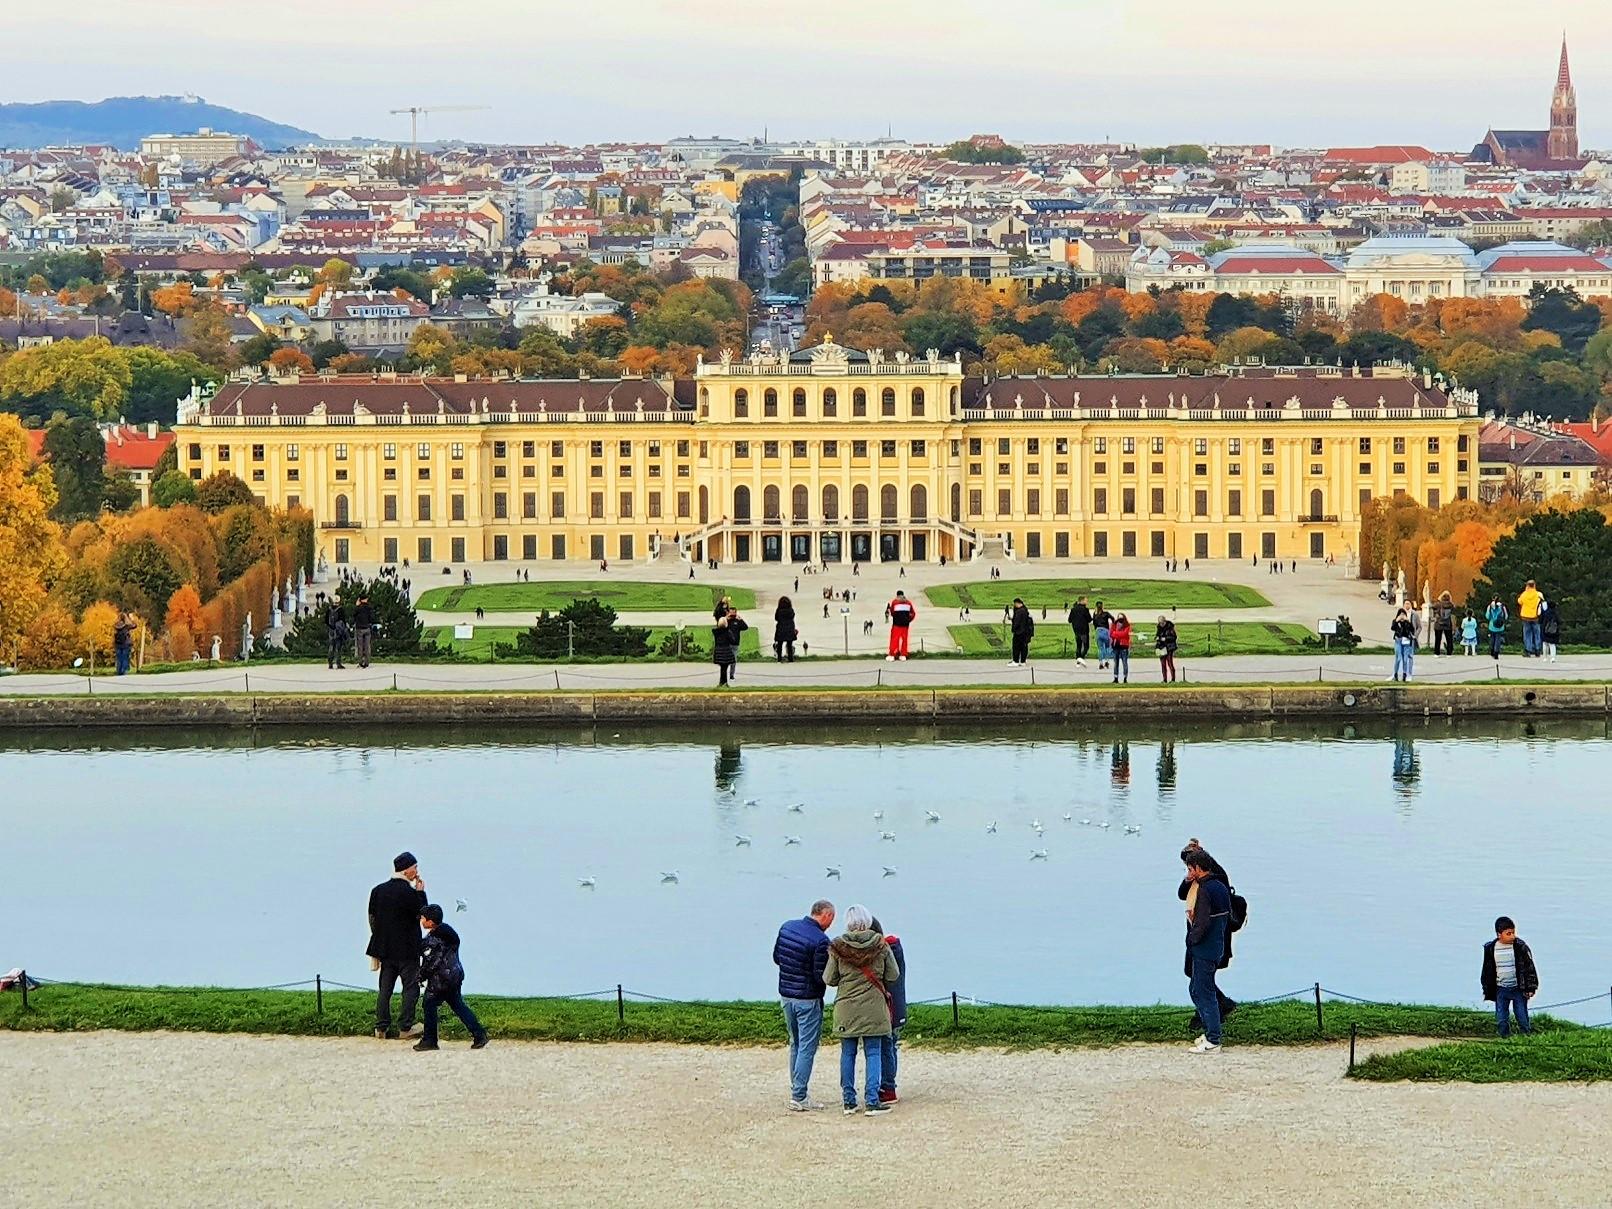 Schloss Schönbrunn und Gloriette Spaziergang, Wien